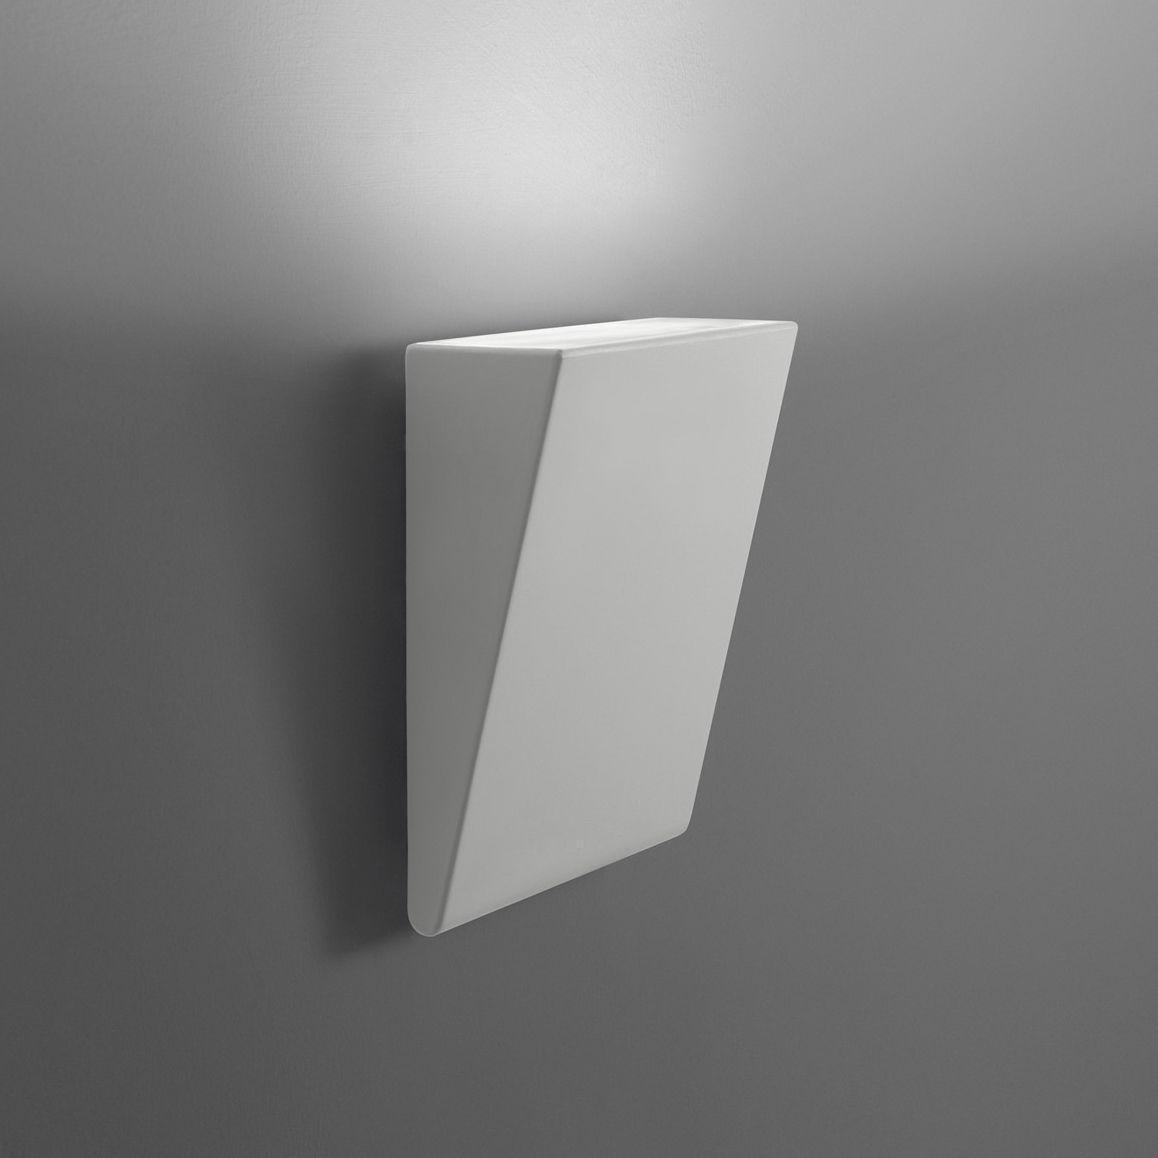 Scopri applique cuneo lampada da terra per esterni - Lampade parete artemide ...